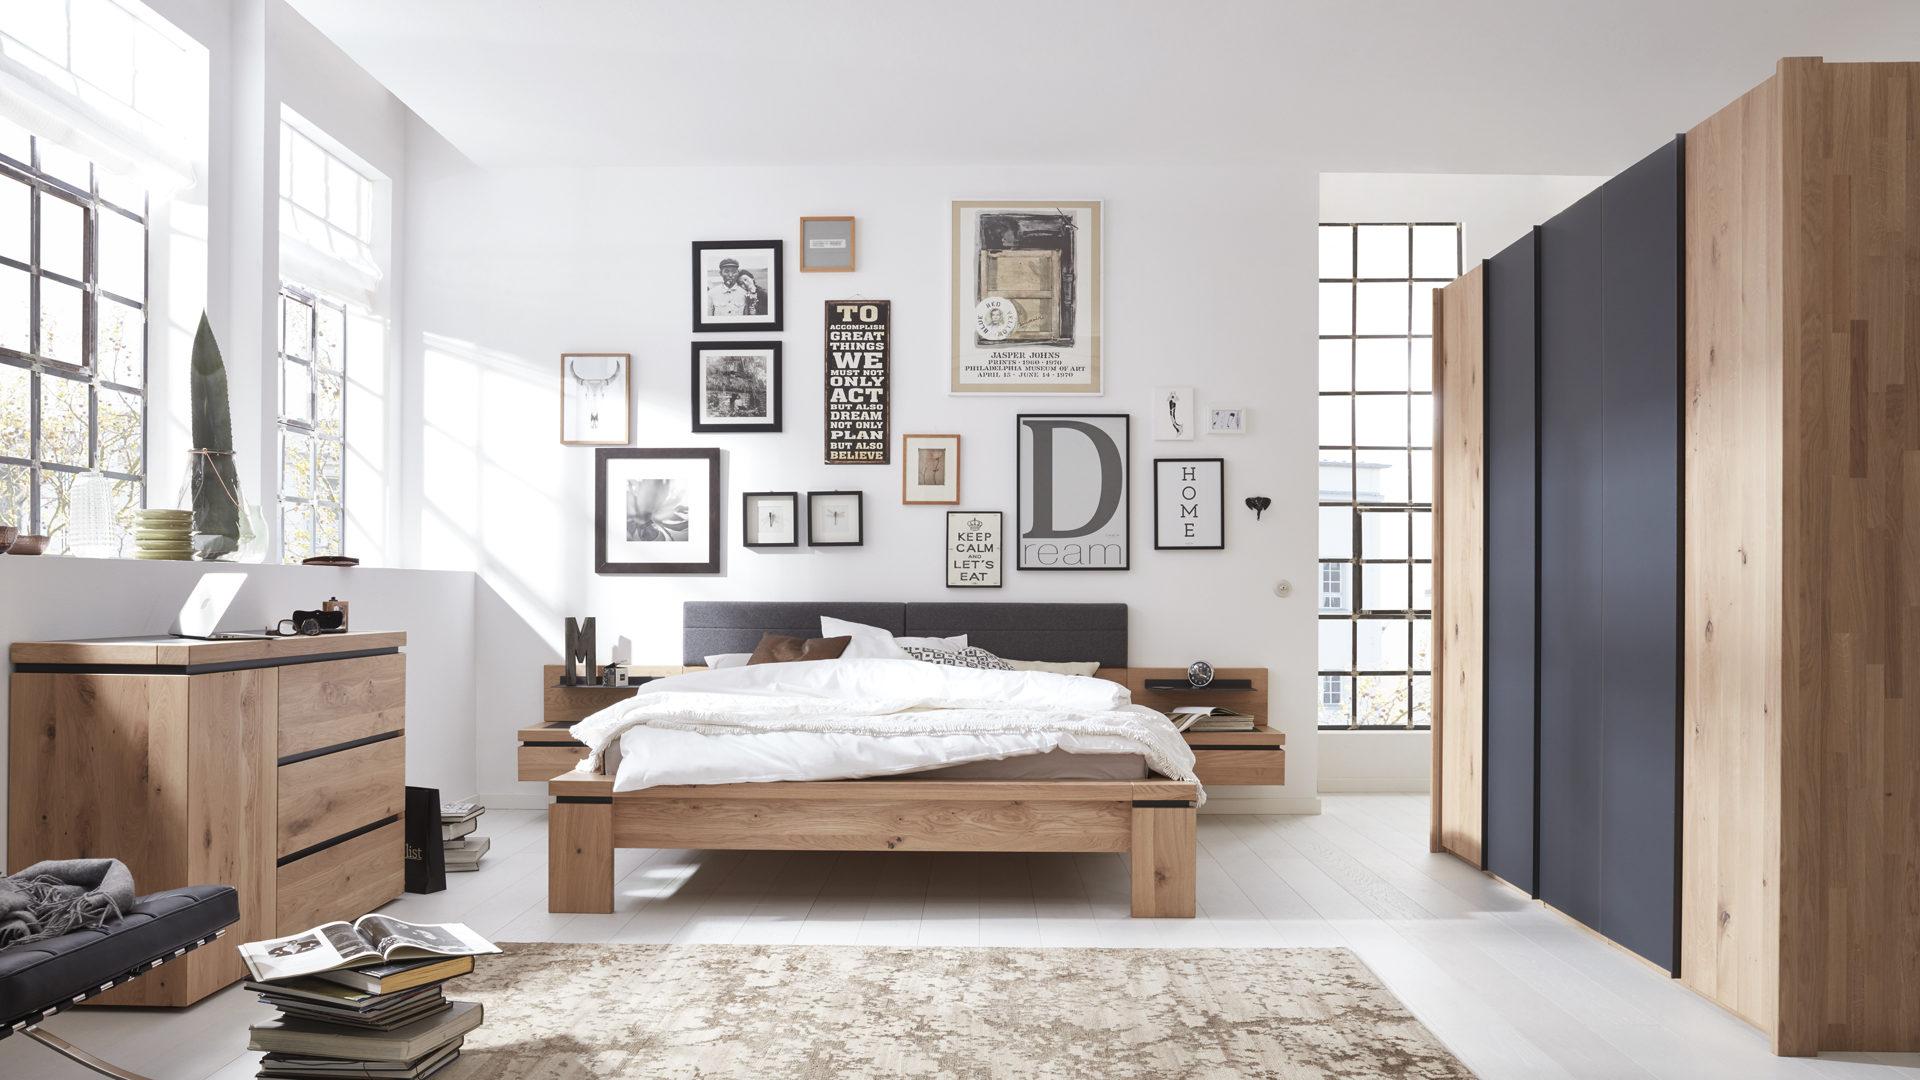 Möbel Boer Coesfeld | Interliving | Schlafzimmer | Interliving